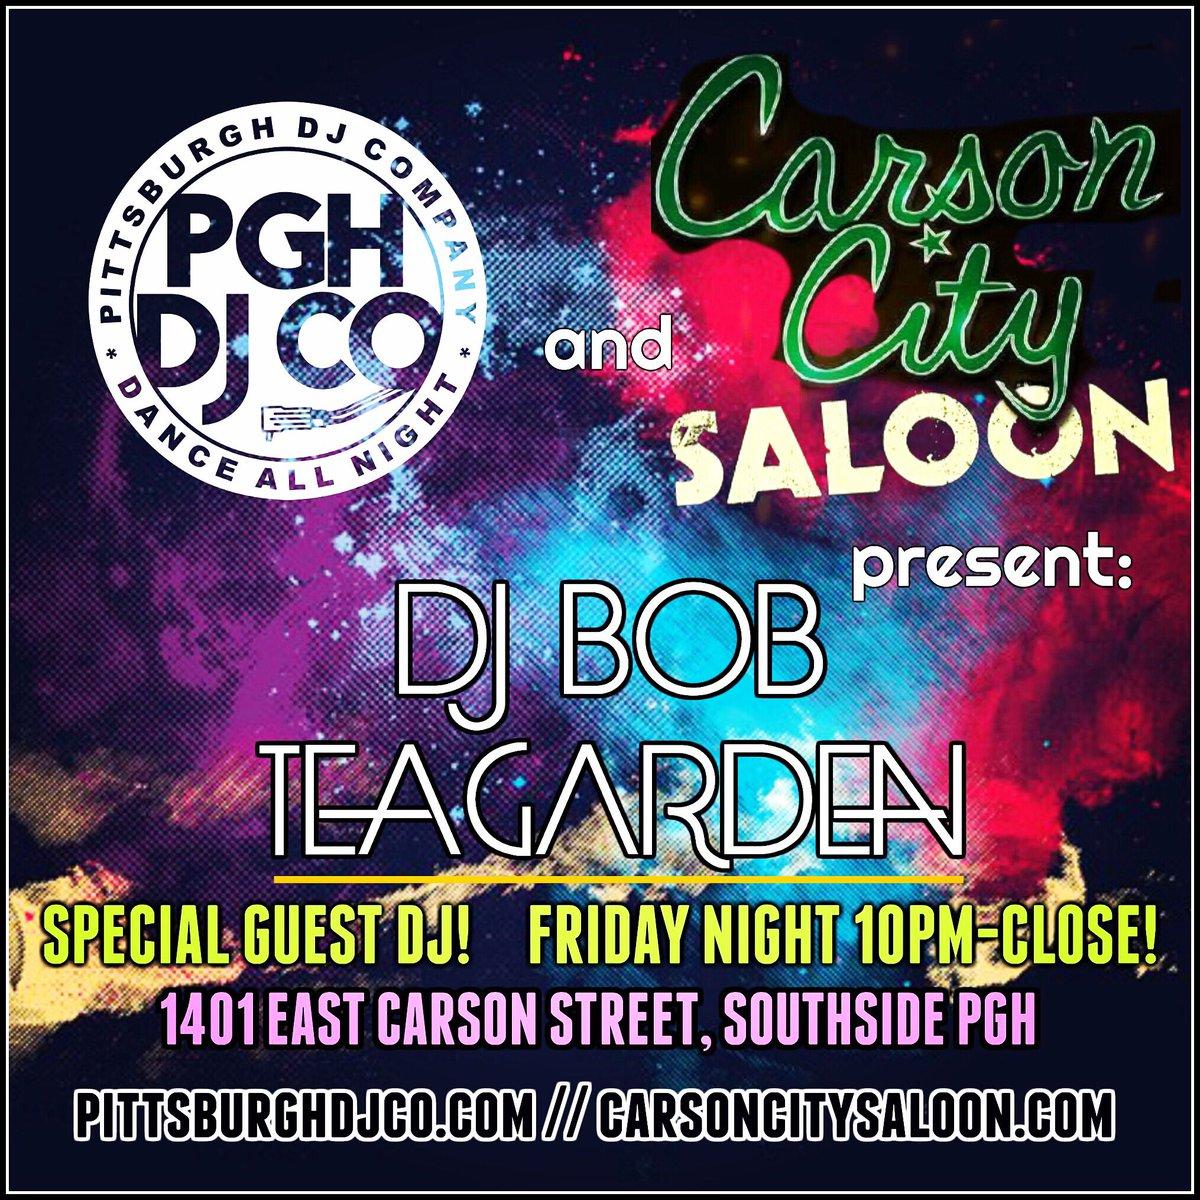 Carson City Saloon (@carsoncity1401) | Twitter